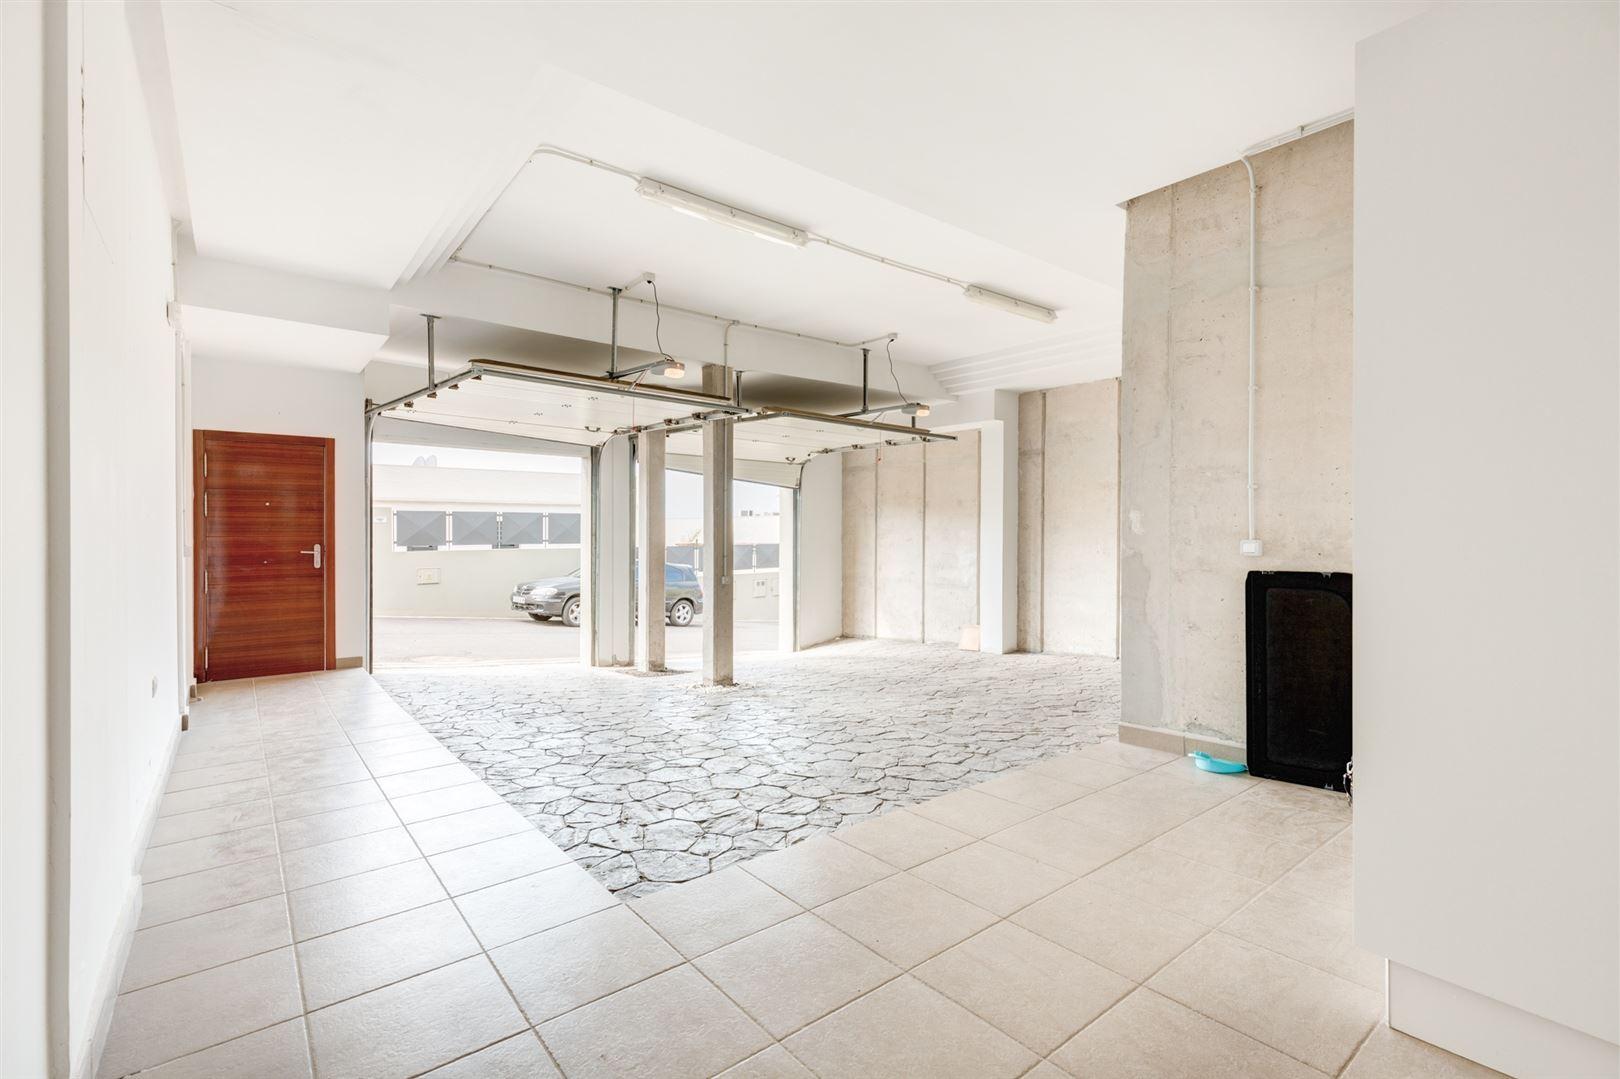 Foto 13 : Appartement te  TENERIFE (Spanje) - Prijs € 645.000